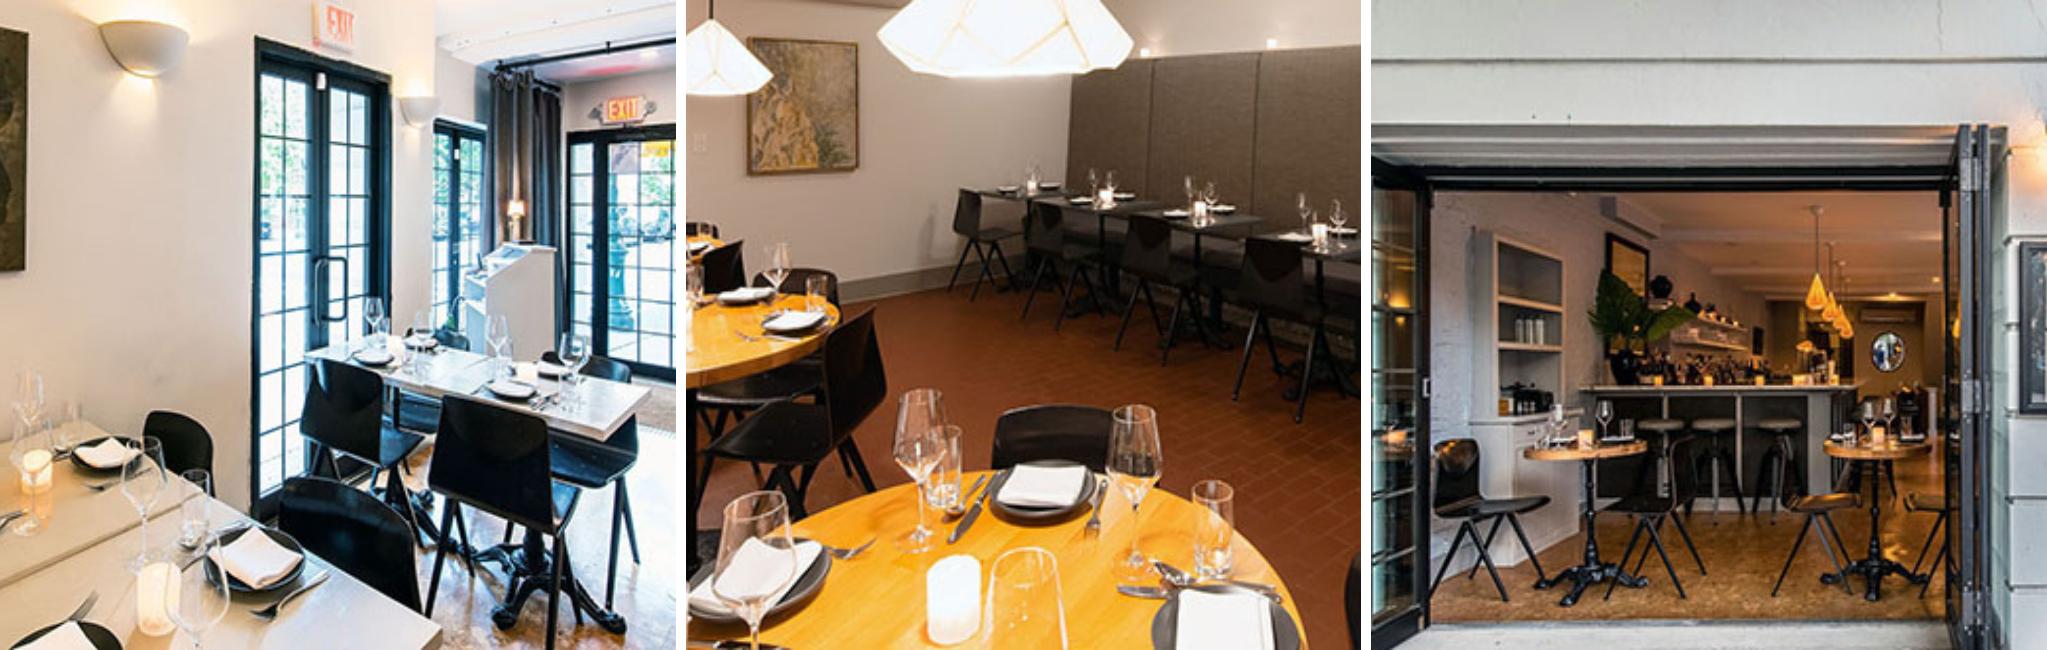 S19 stoelen restaurant project